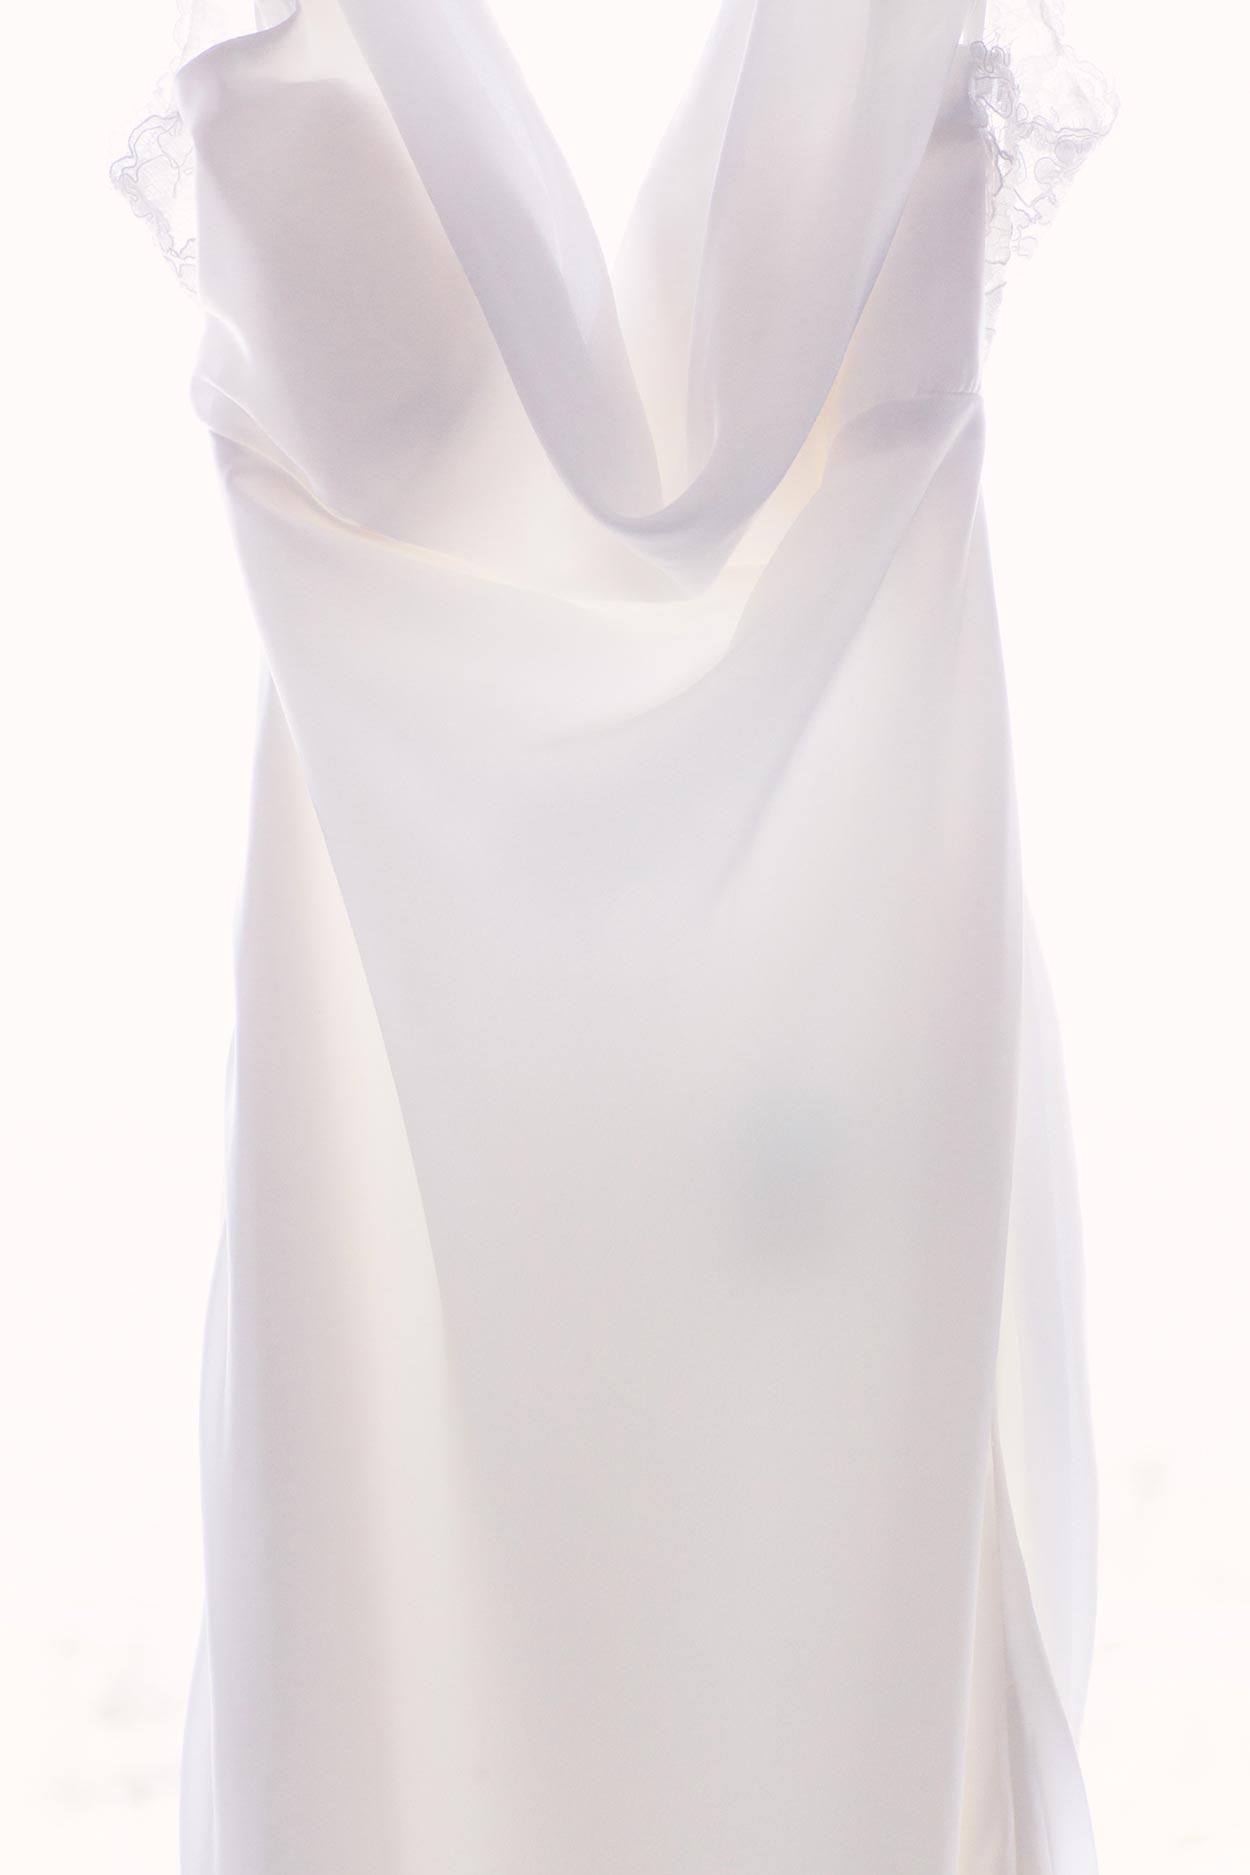 Stunning Brisbane Designer Wedding Dress - Sunshine Coast,Australian Destination Photographer